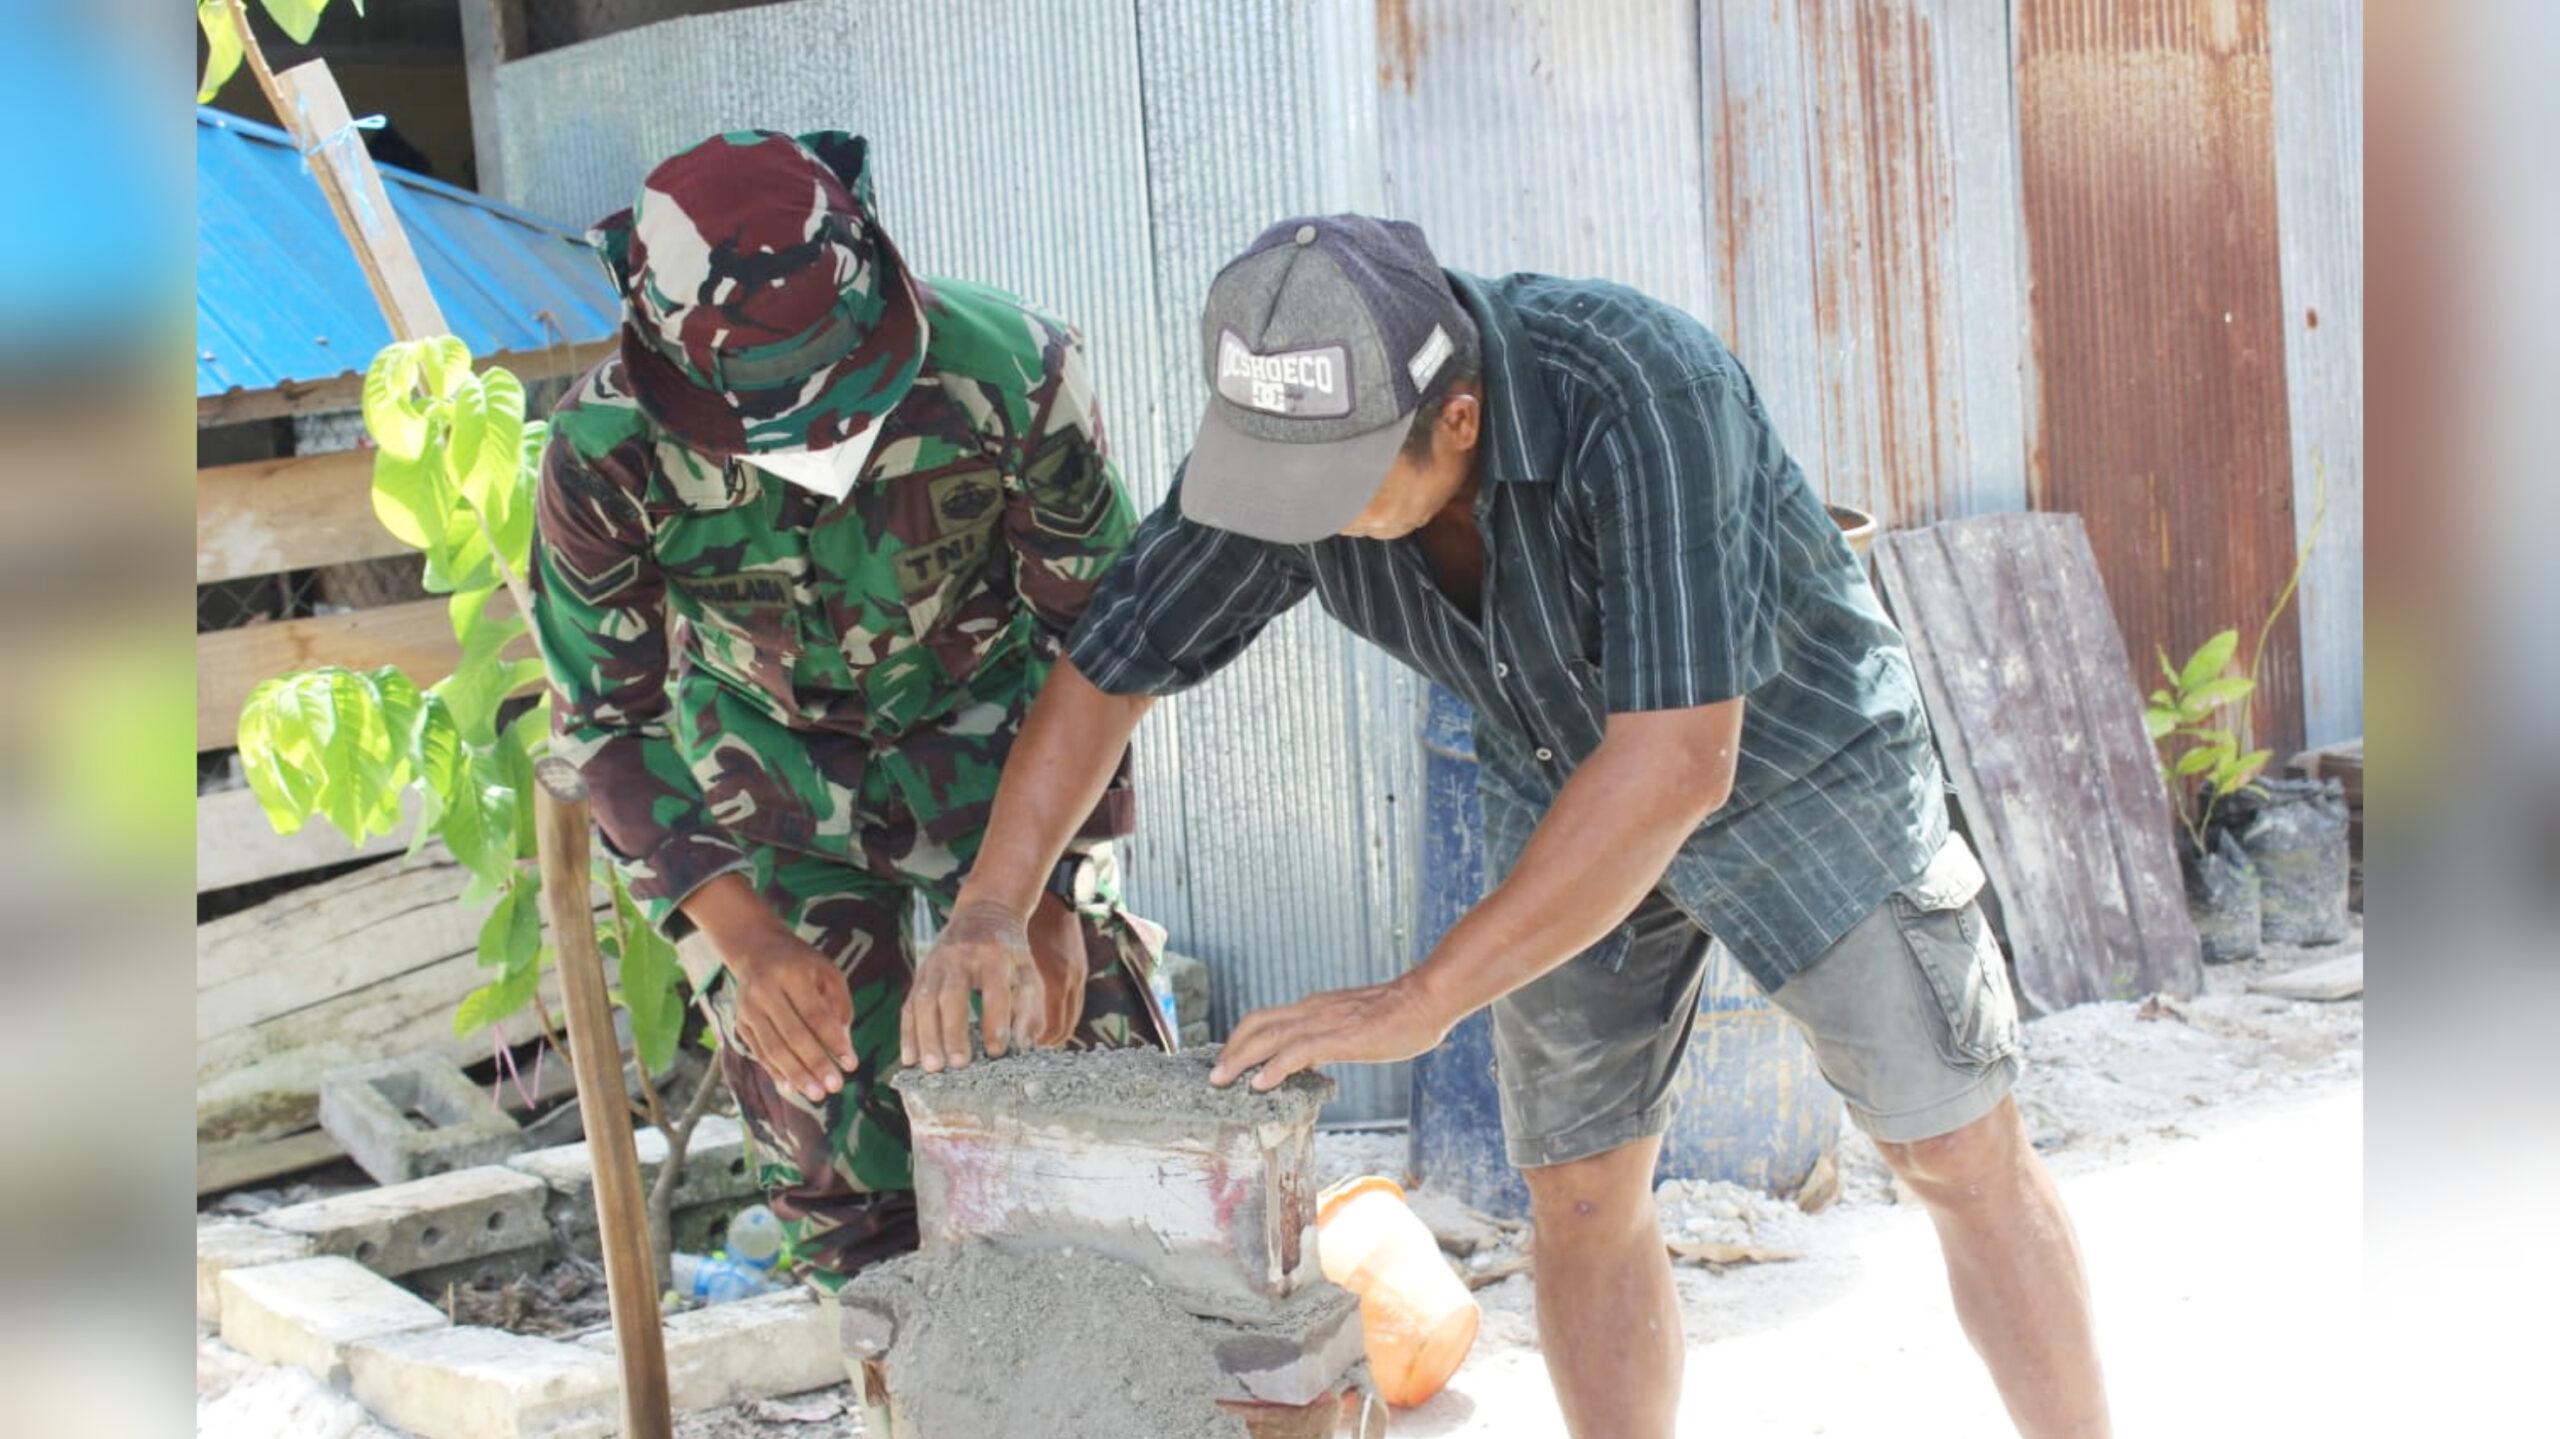 Anggota Satgas TMMD Bantu Warga Sambil Belajar Bikin Batako